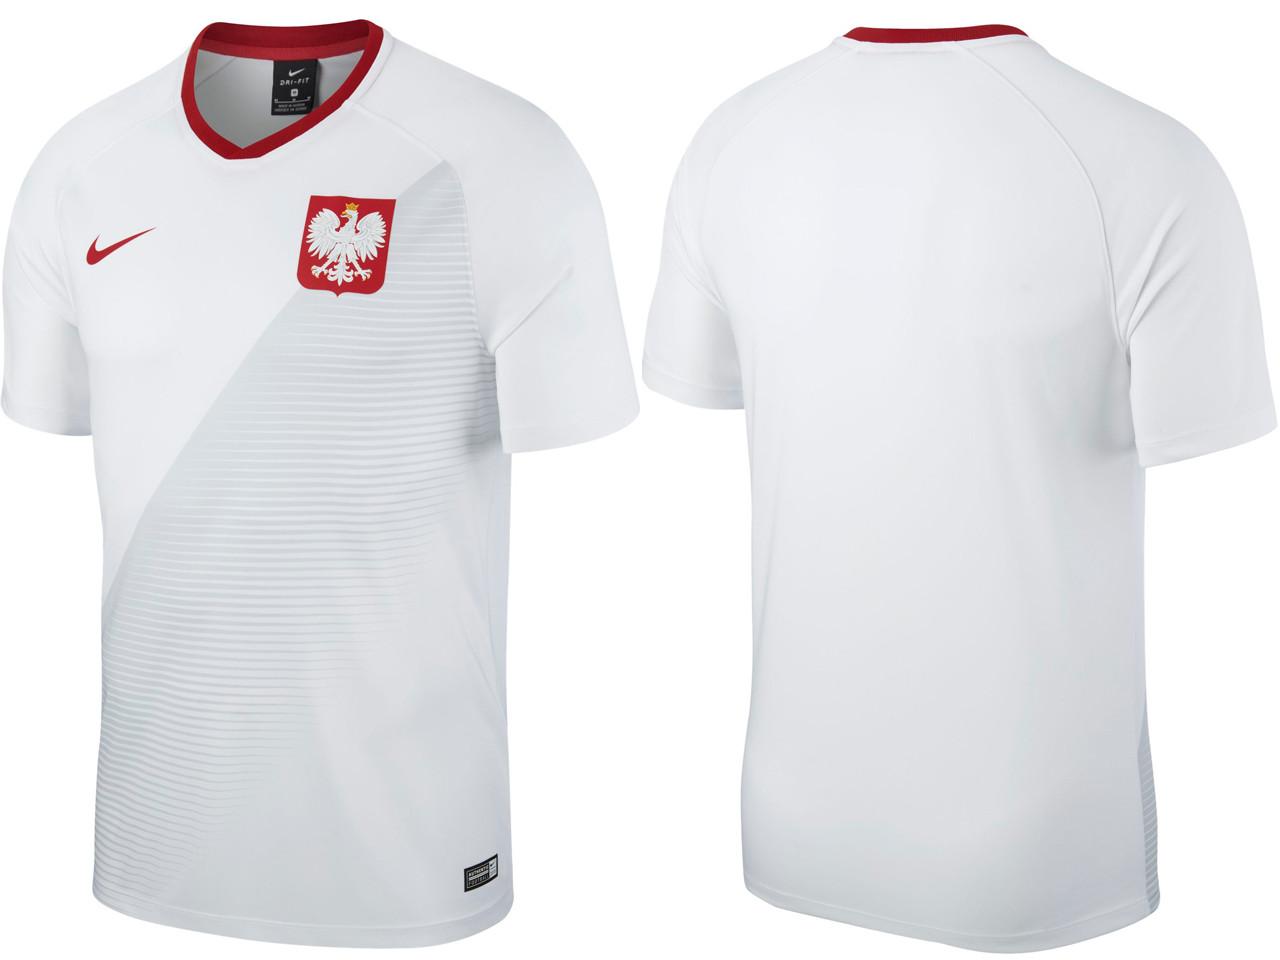 Koszulka Nike POLSKA 894013 100 r. S 128-137cm